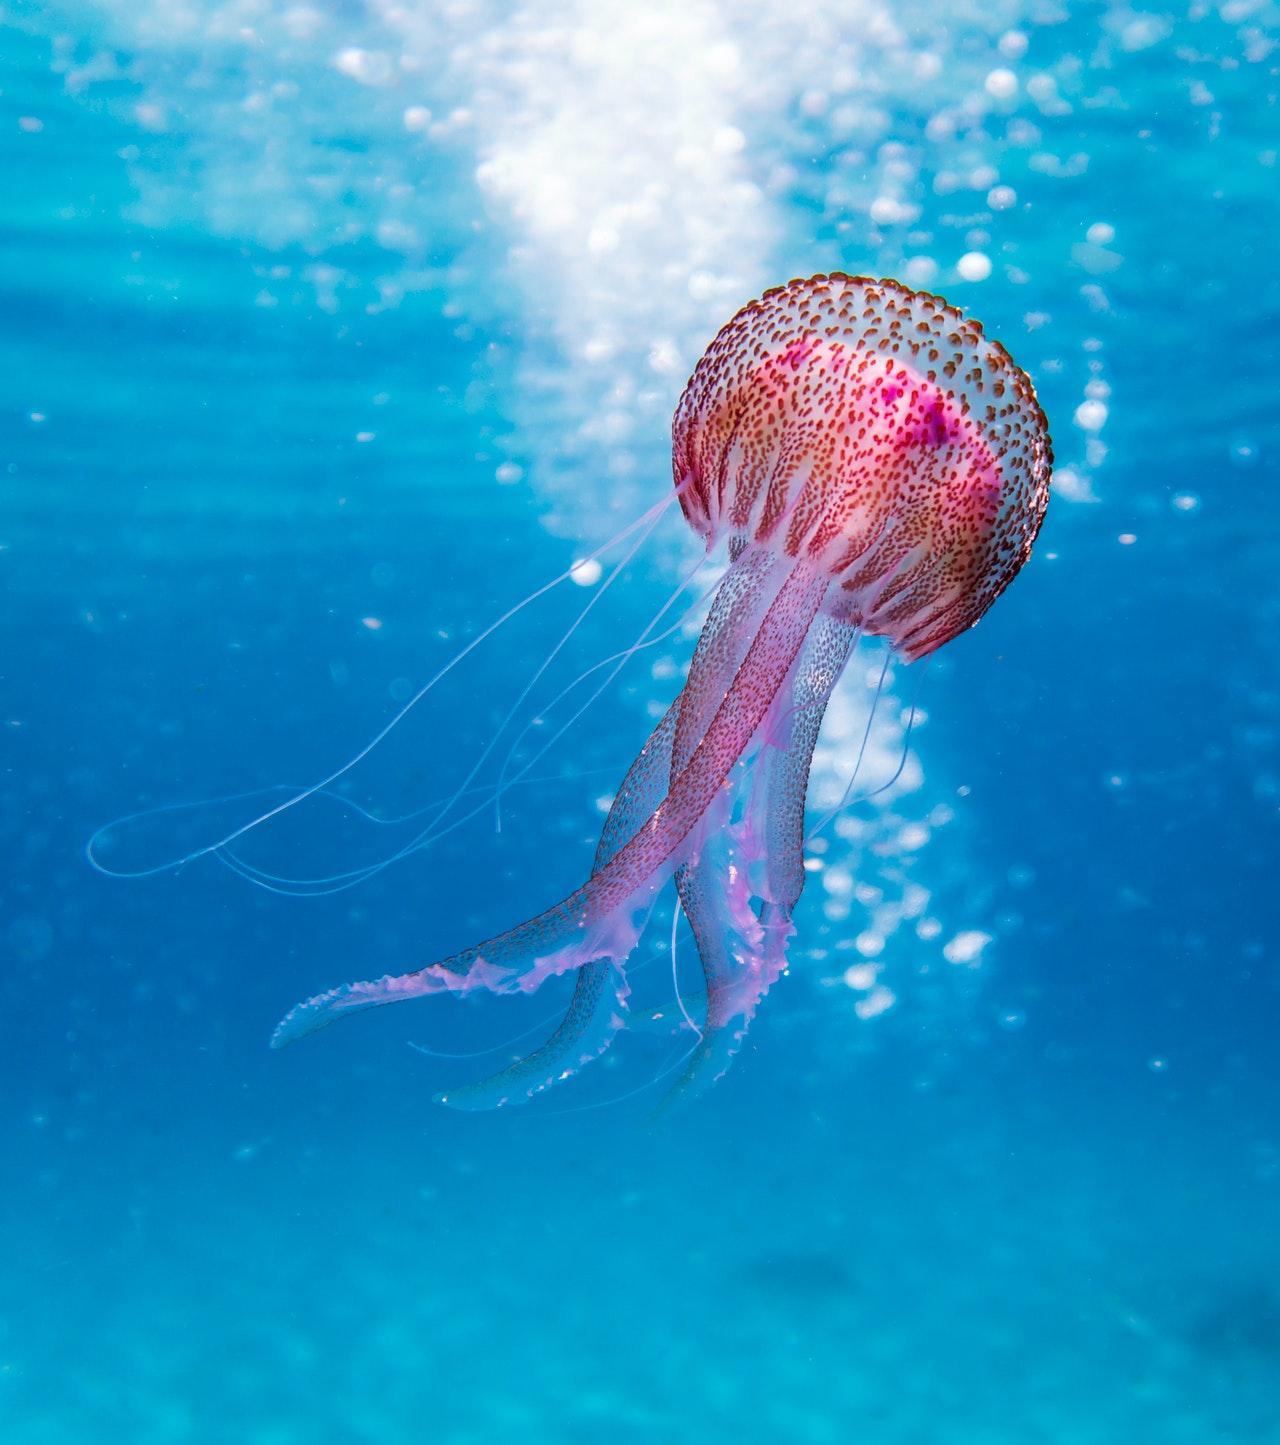 www.atozmomm.com summer bible study online bsf wordgo study of hebrews jellyfish